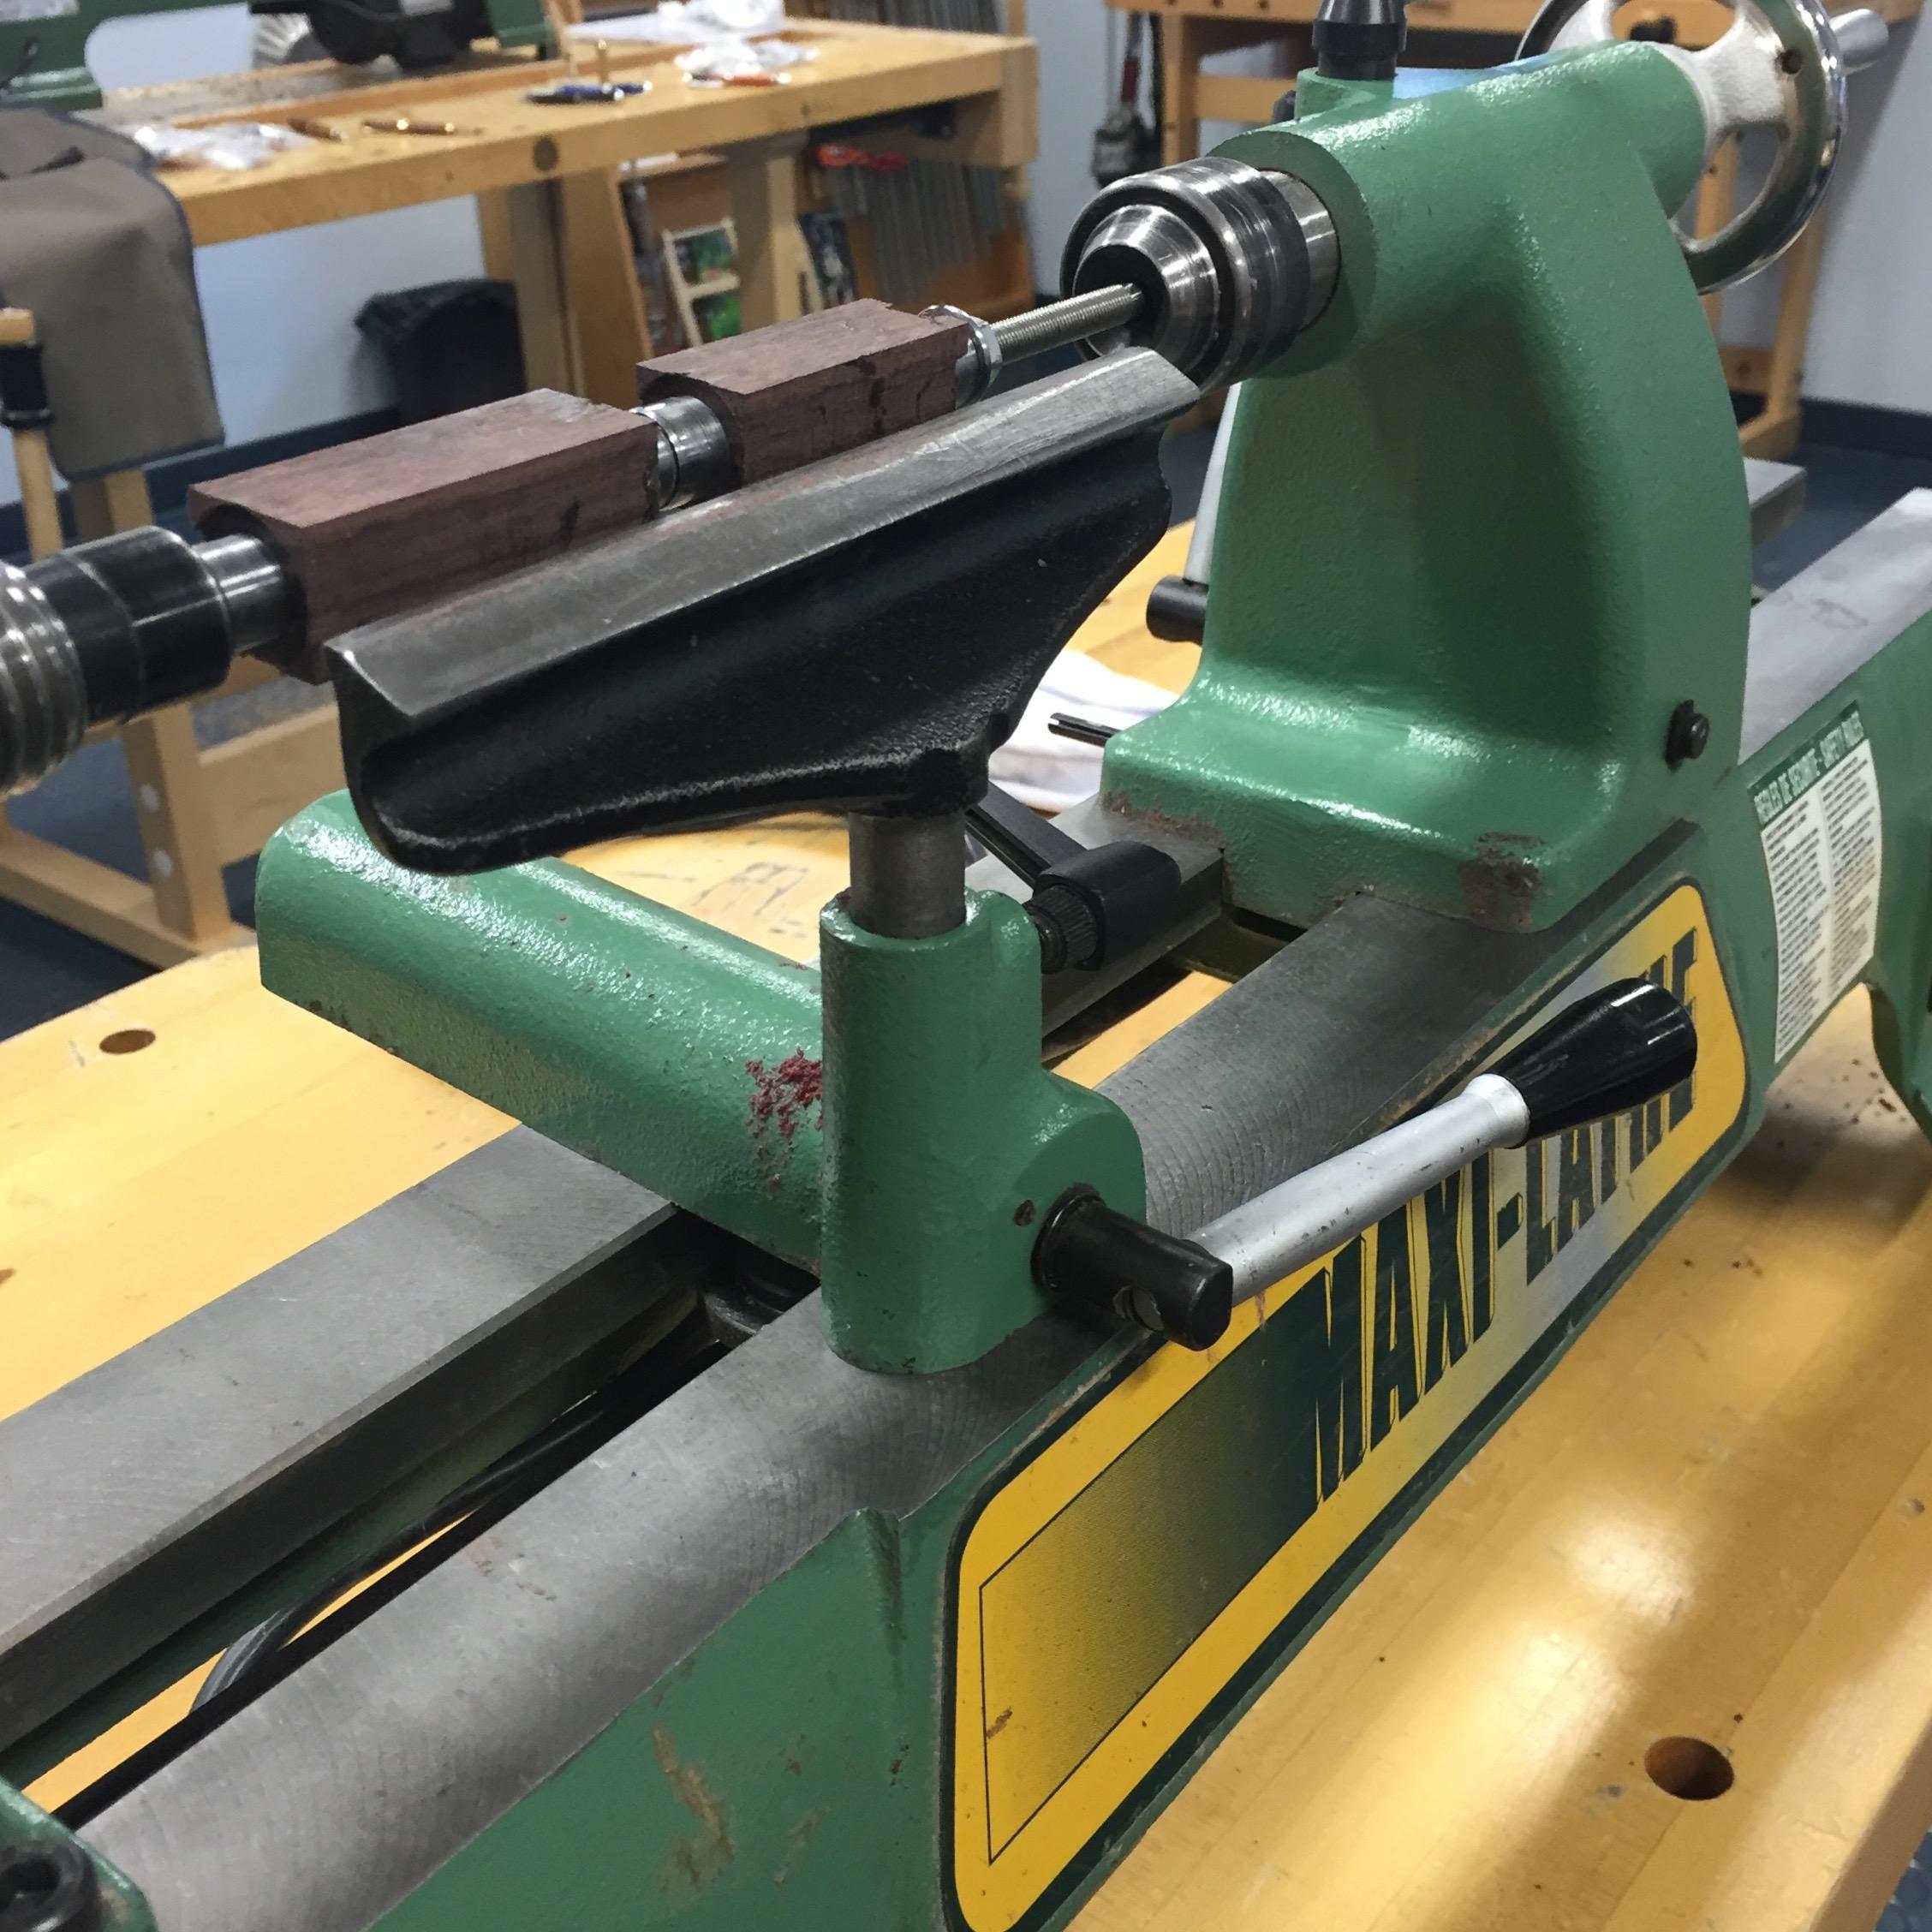 DIY Pen Rosewood on lathe || via The Design Edit